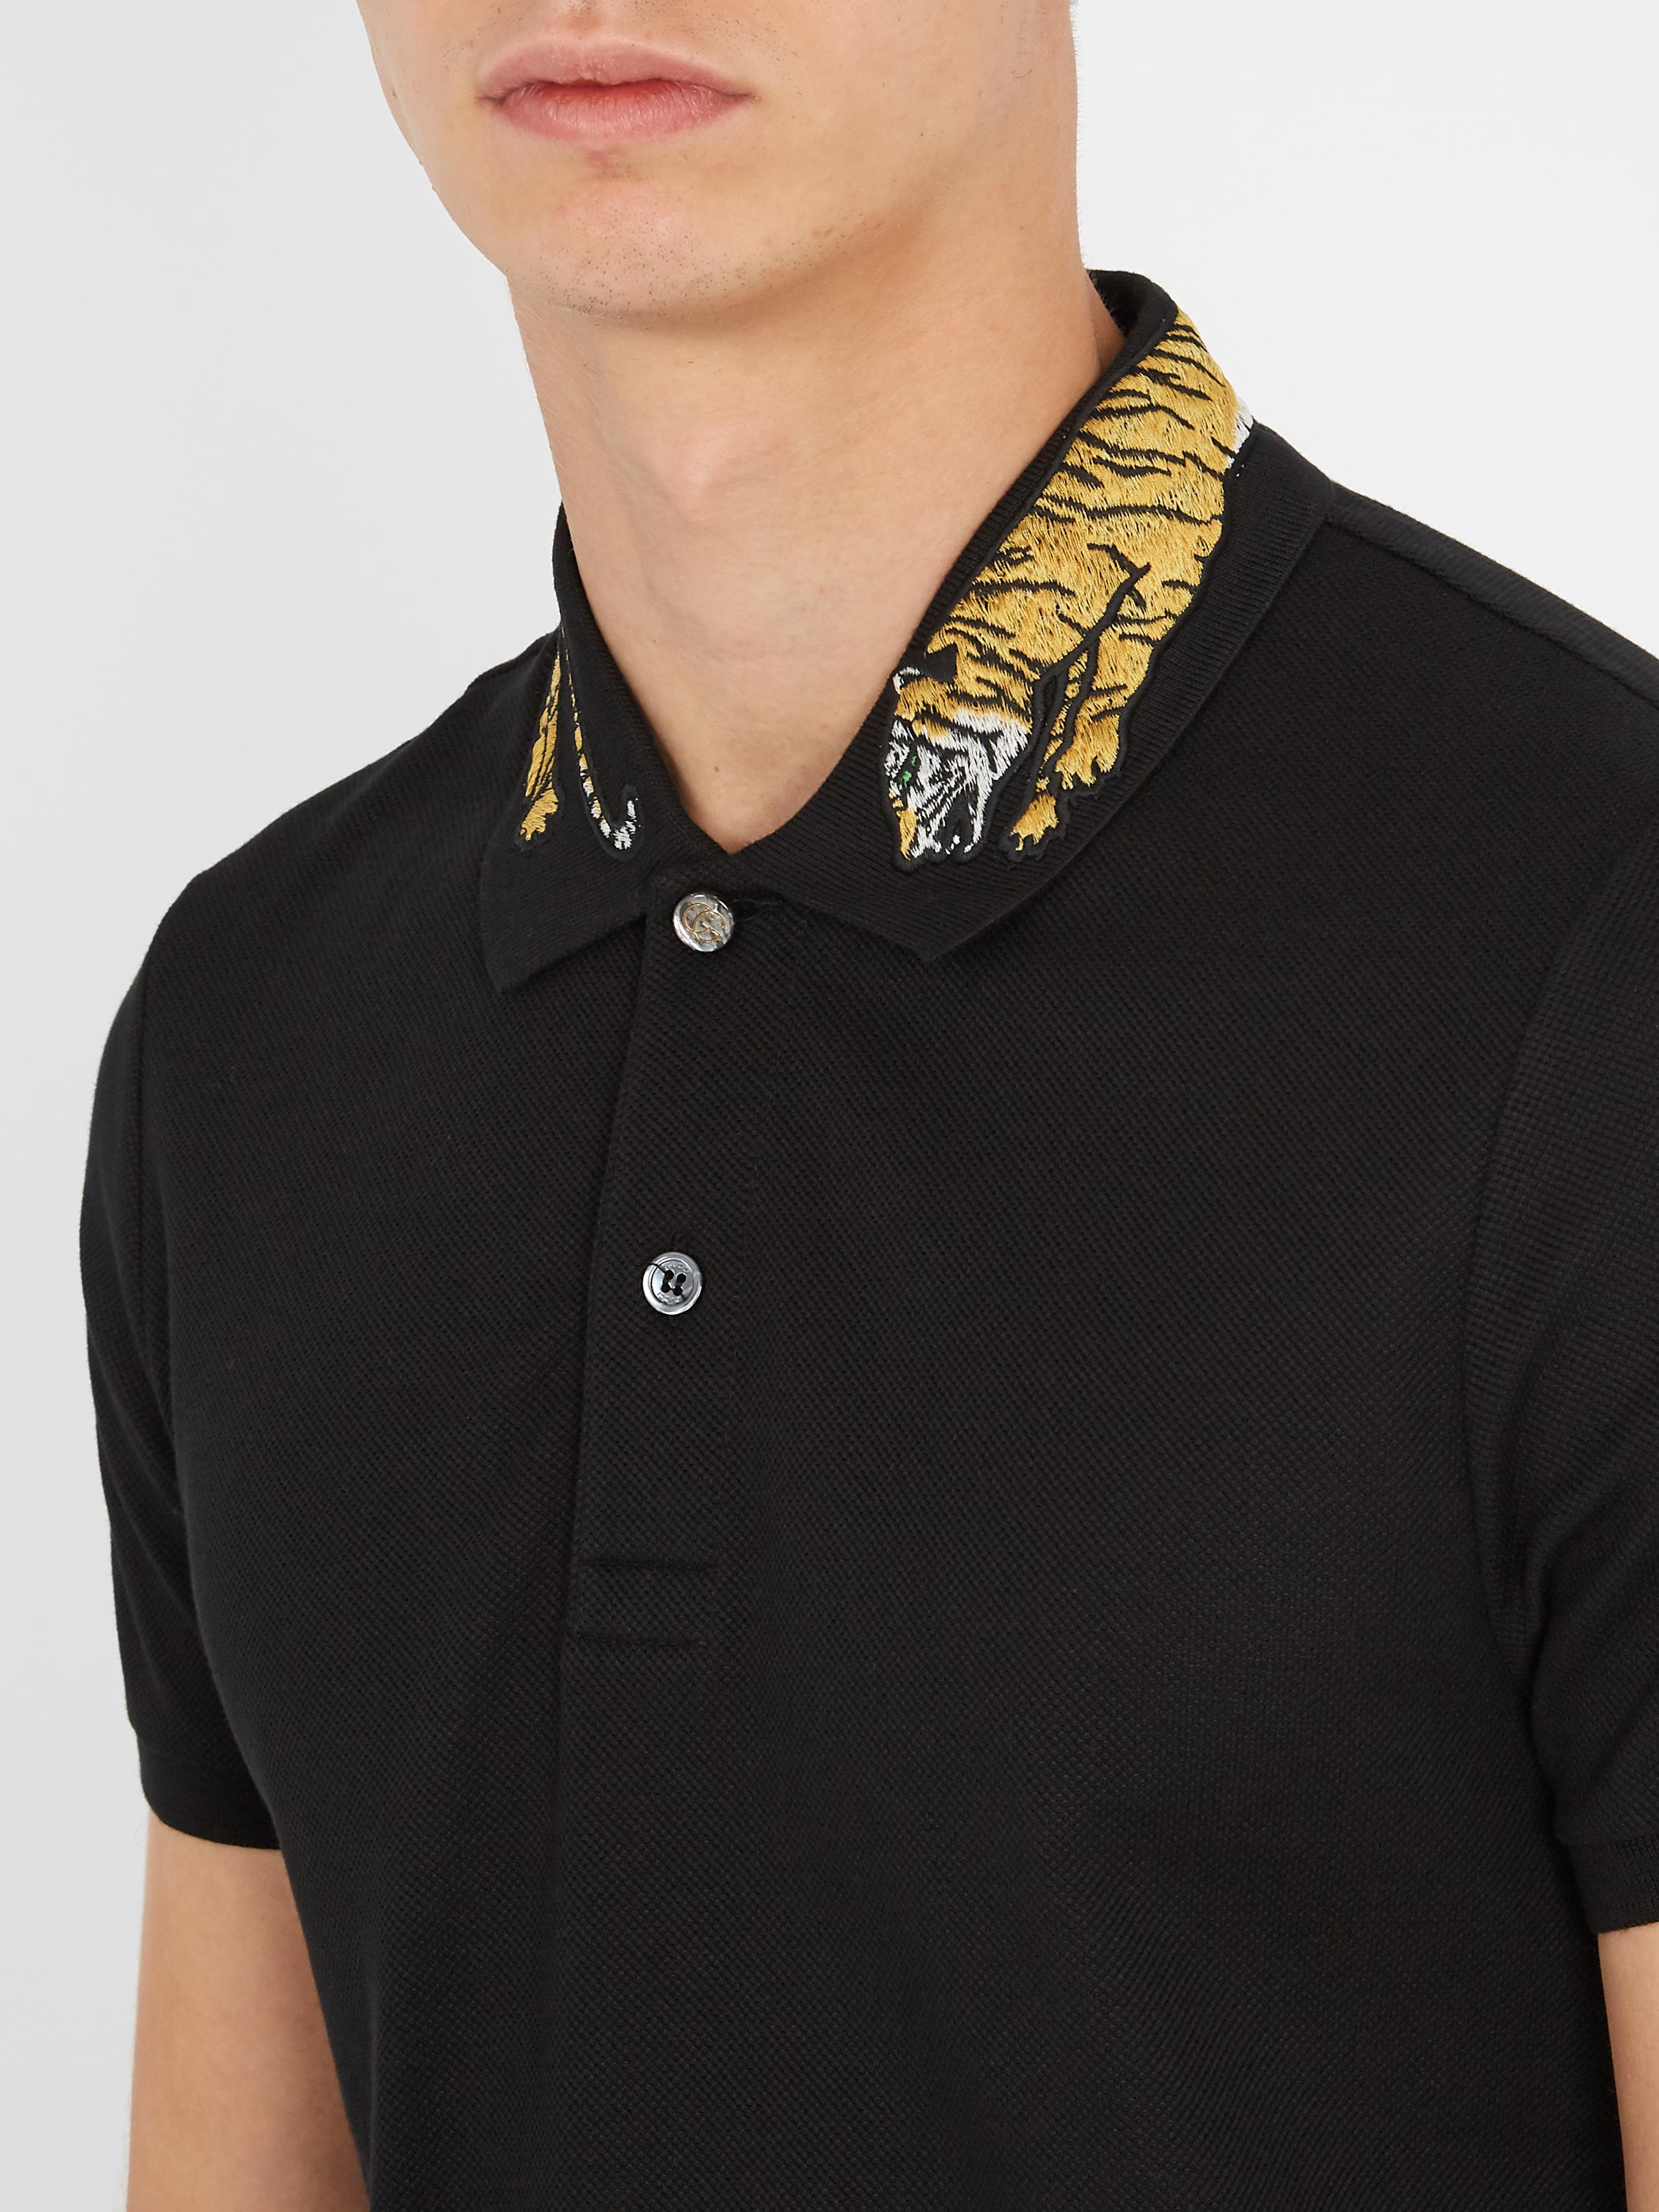 db1d272dc51 Lyst - Gucci Tiger-appliqué Cotton-blend Piqué Polo Shirt in Black ...